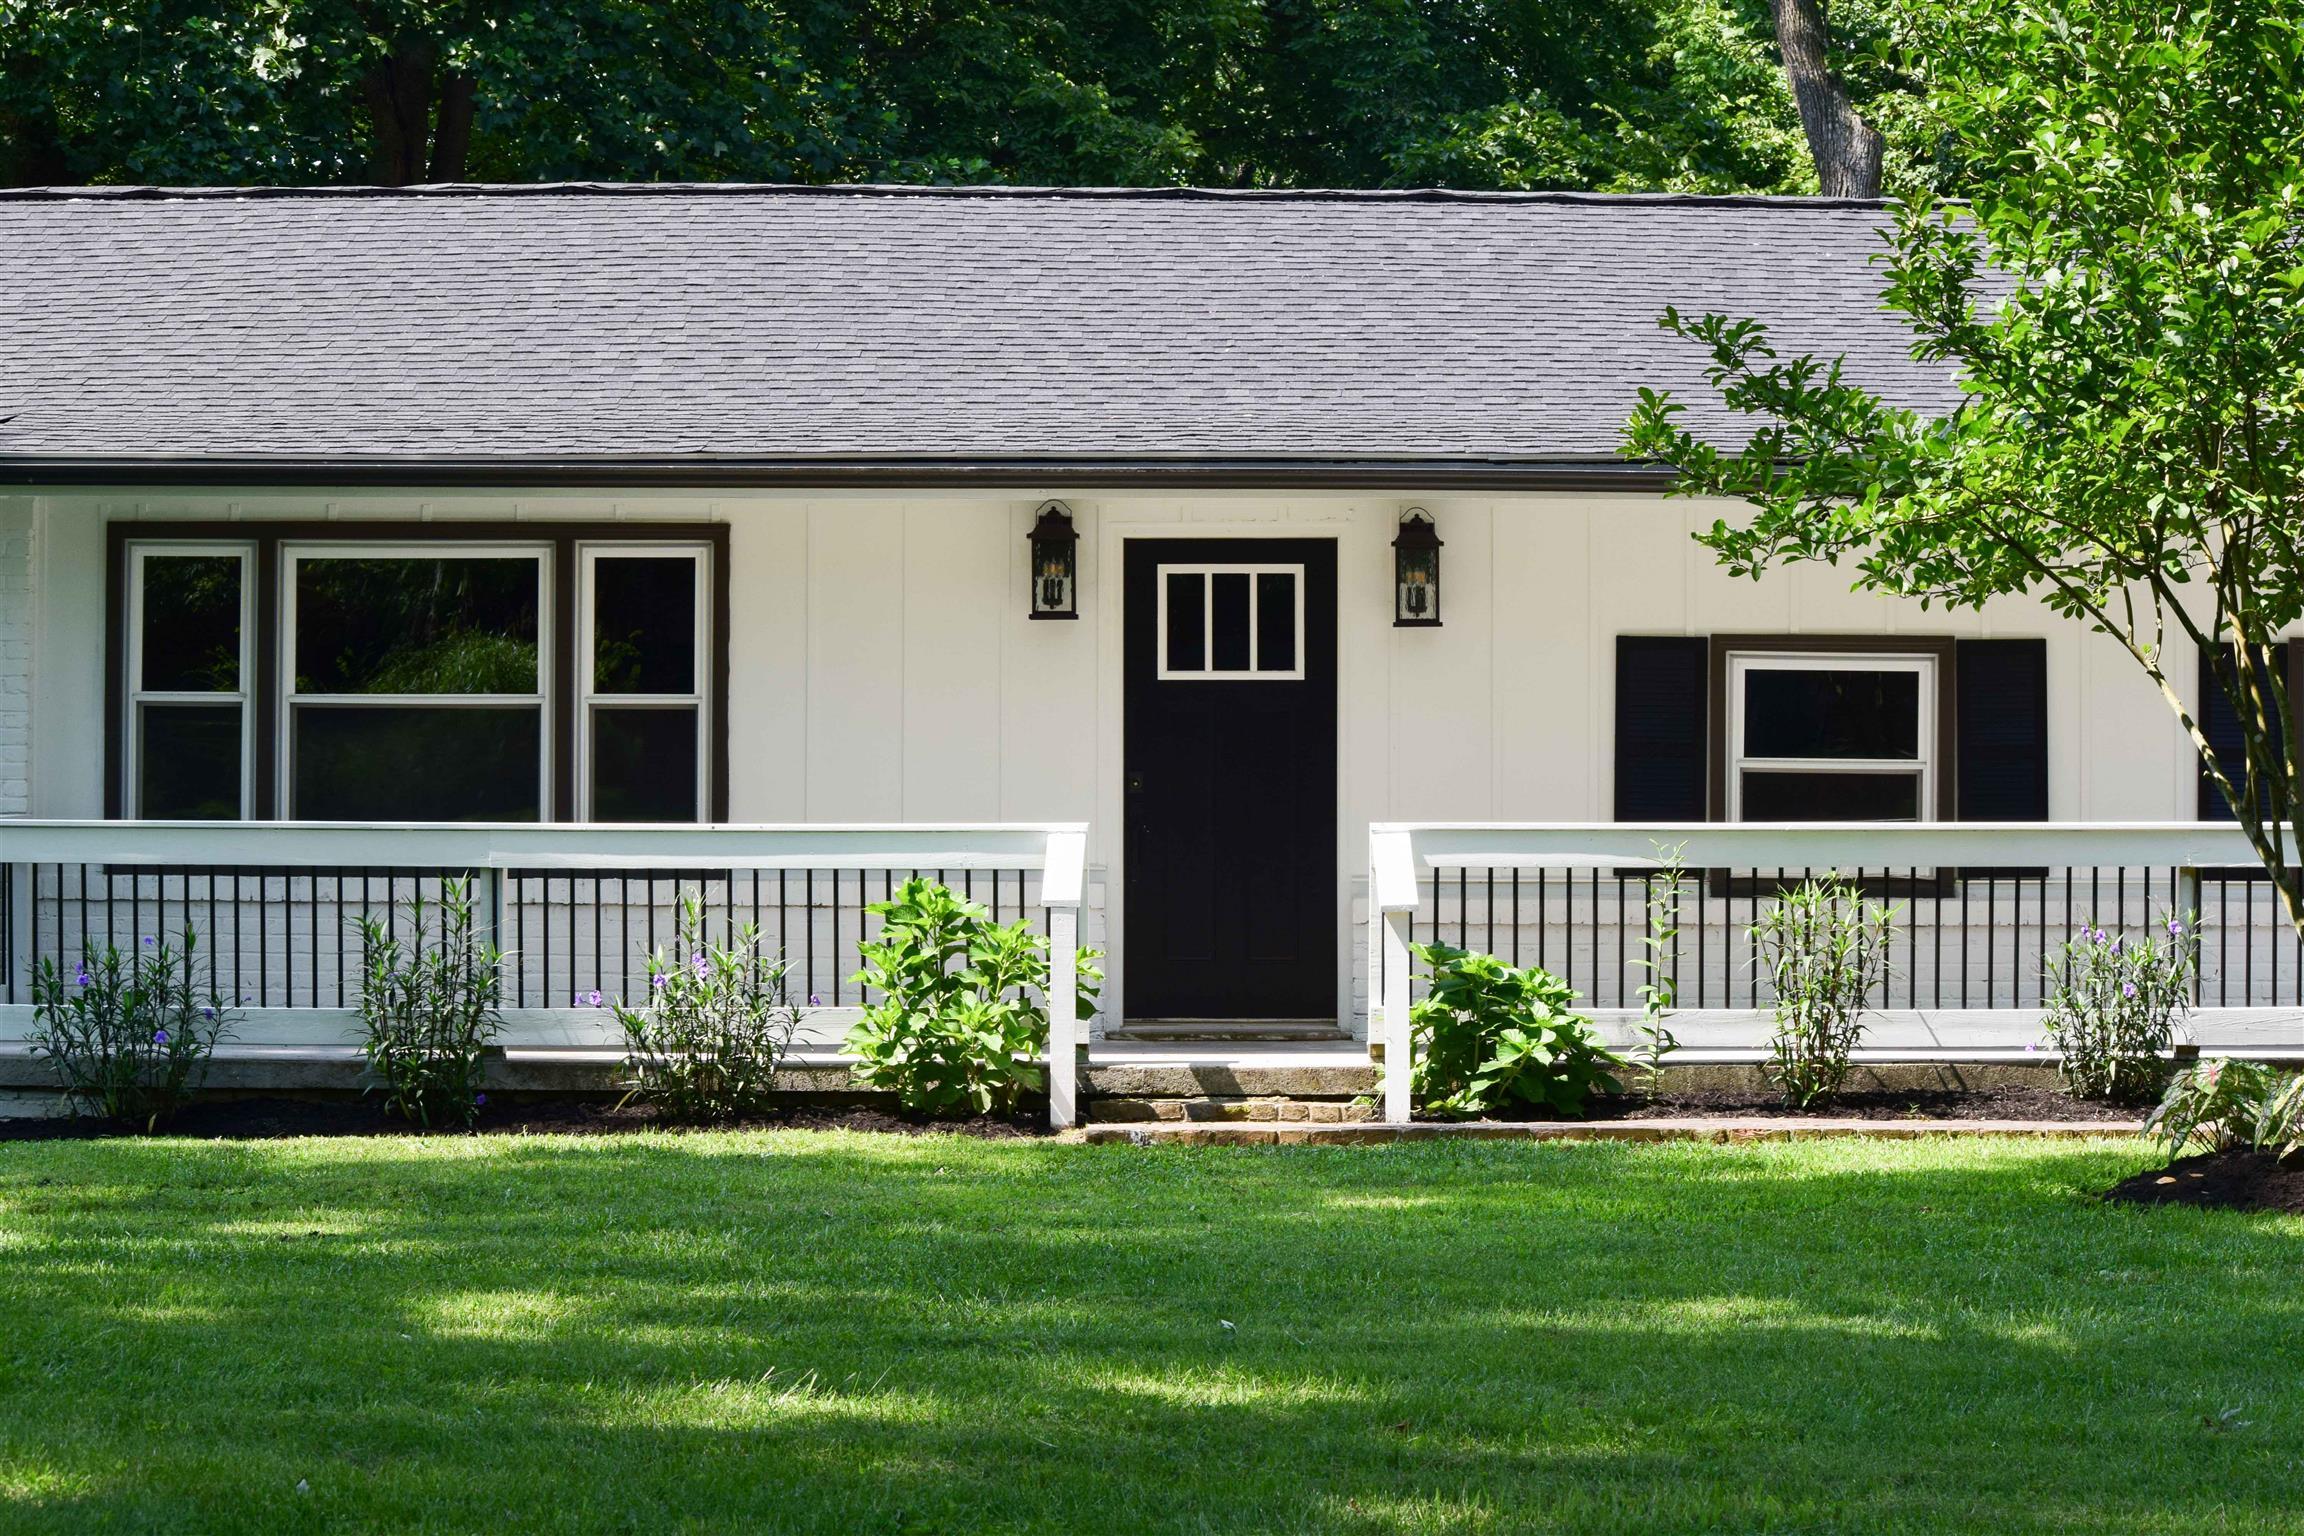 119 Sunset Circle, N, Hopkinsville, KY 42240 - Hopkinsville, KY real estate listing